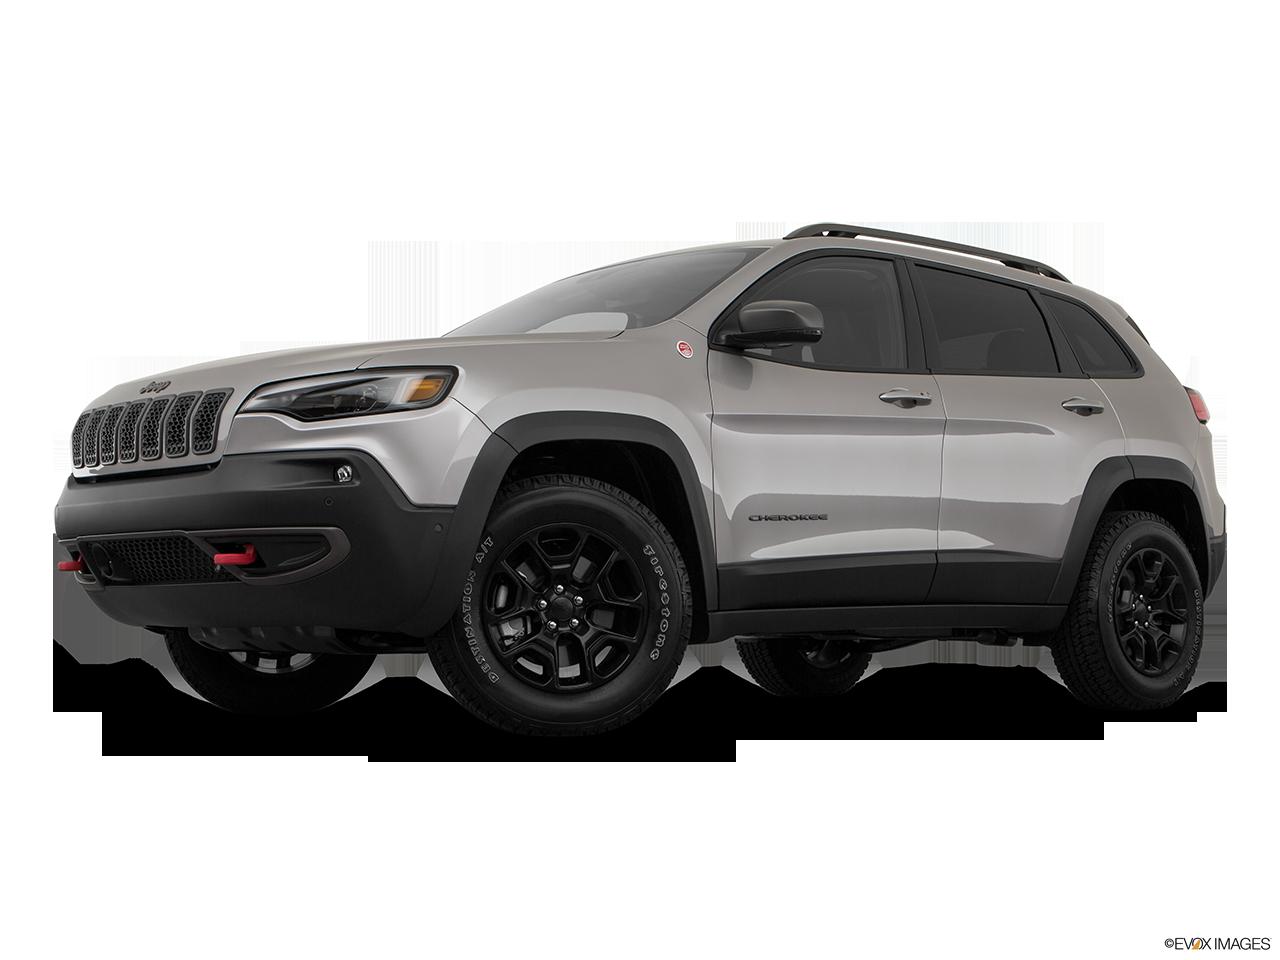 2020 Jeep Cherokee photo